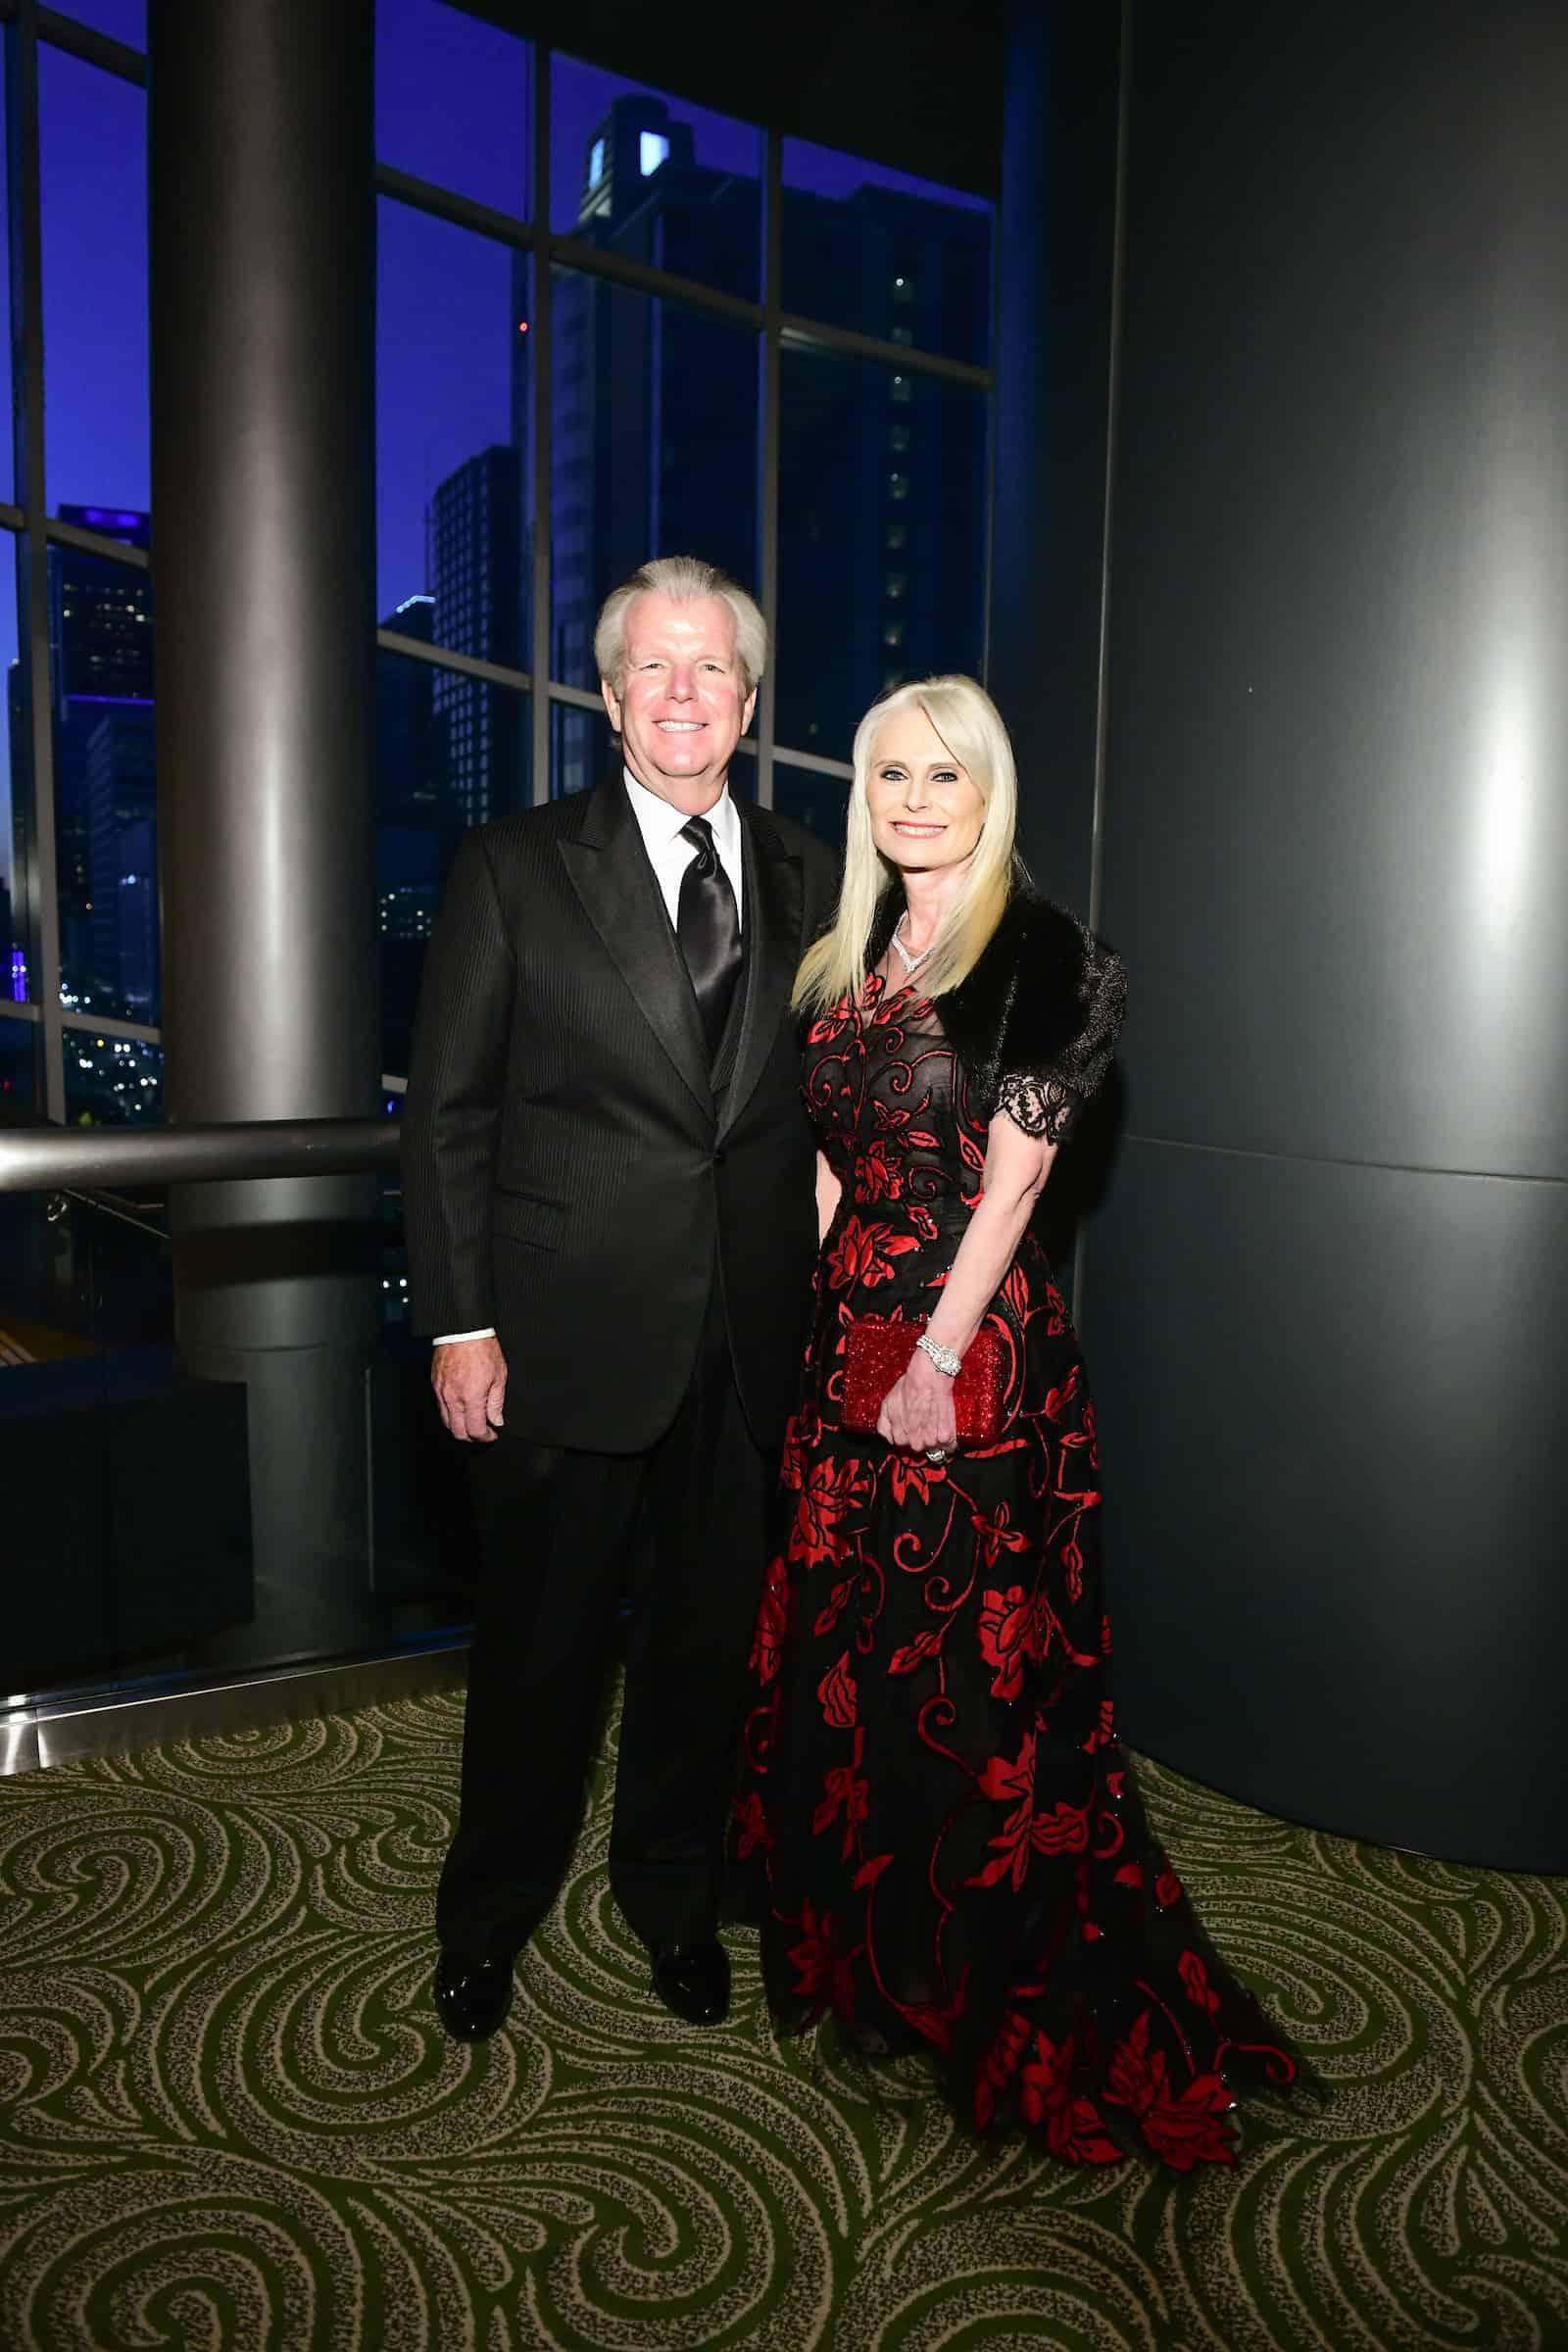 Gregg and Jo Lynn Falgout